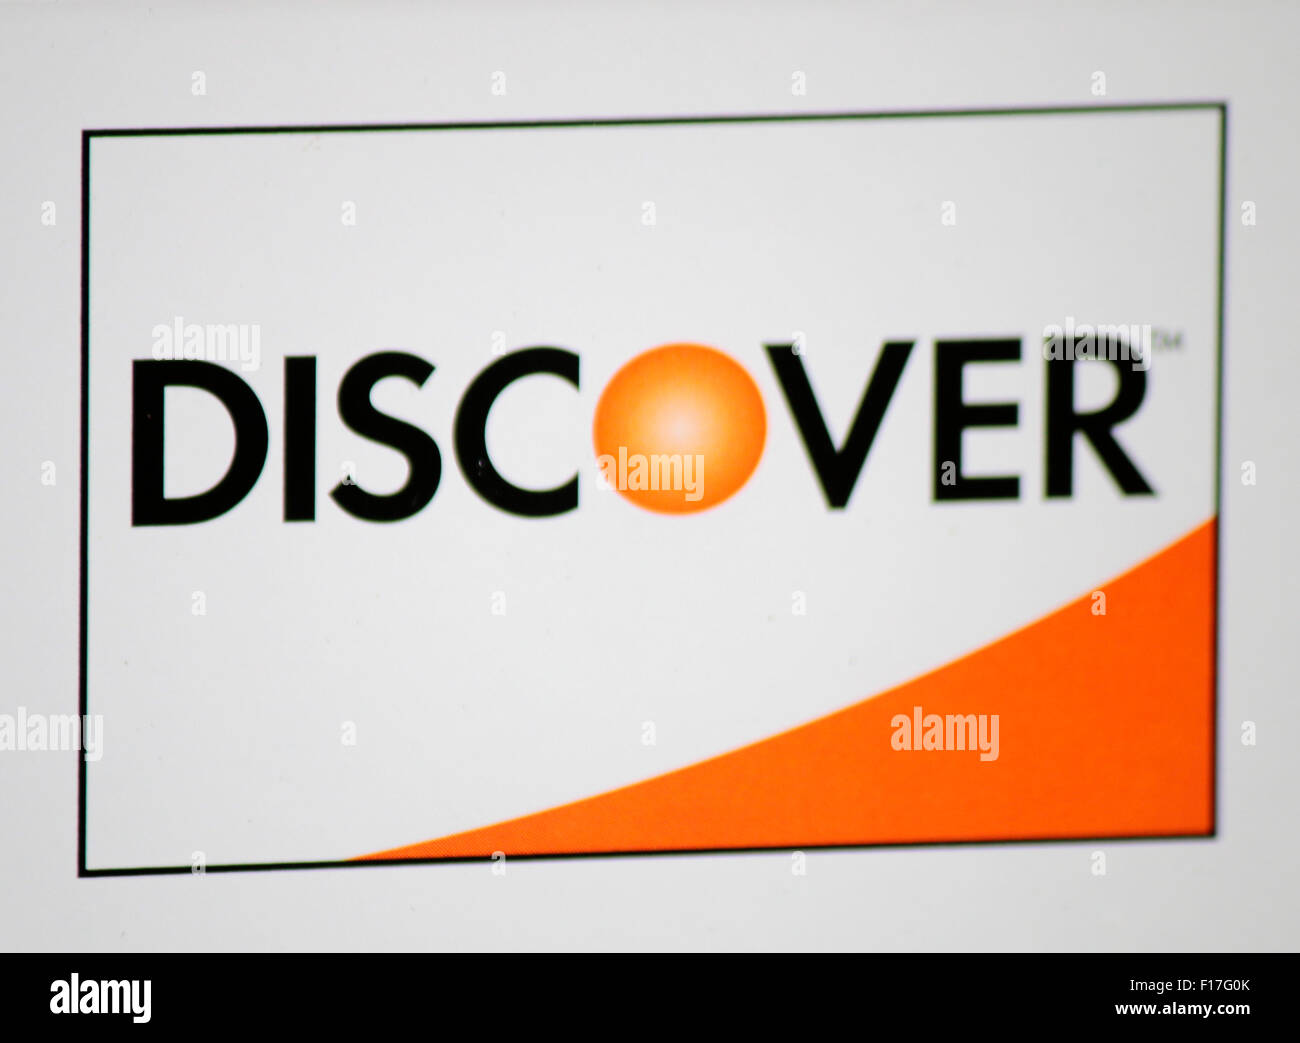 Markennamen: 'Discover', Berlin. Photo Stock